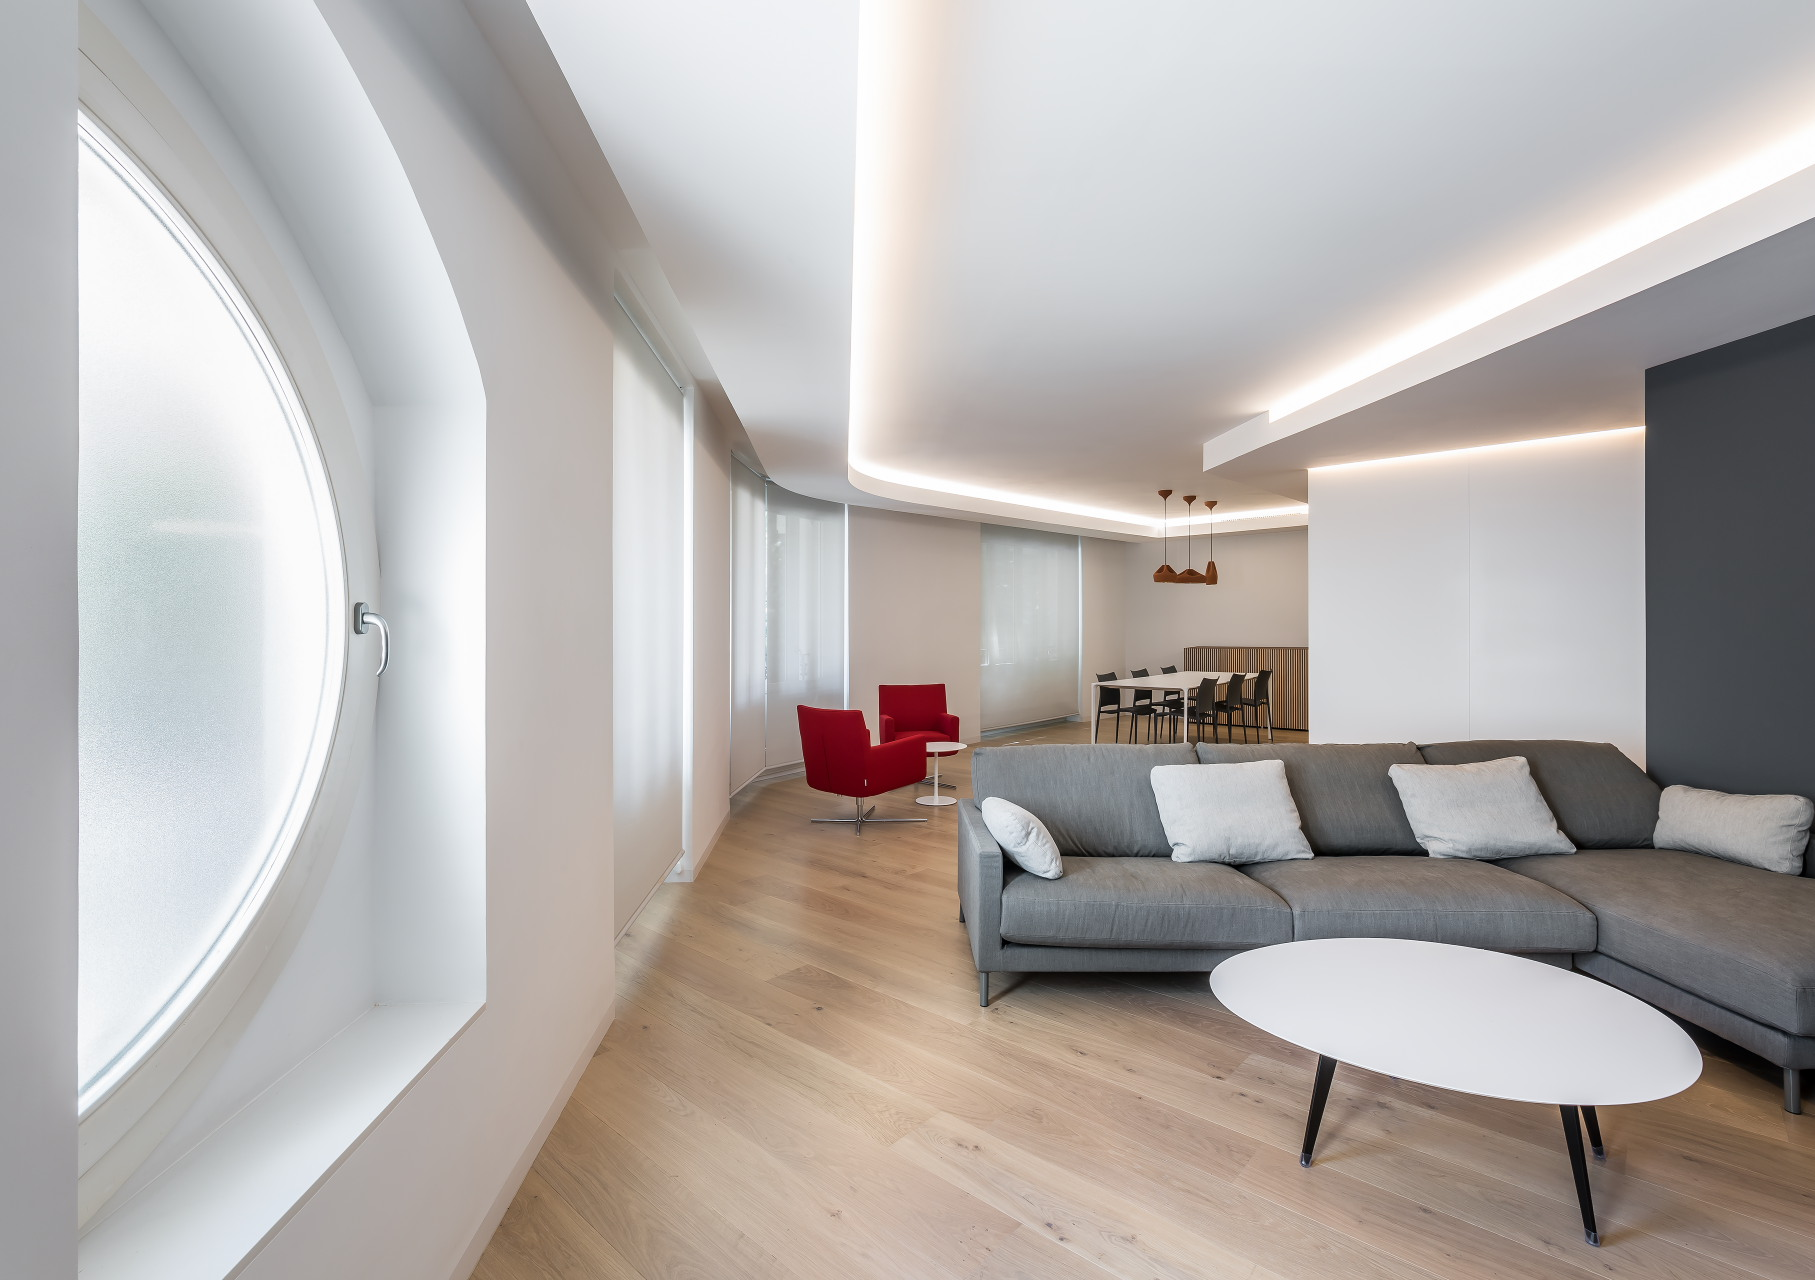 fotografia-arquitectura-interiorismo-valencia-german-cabo-gallardo-llopis-bfm-edificatoria-turia02 (4)